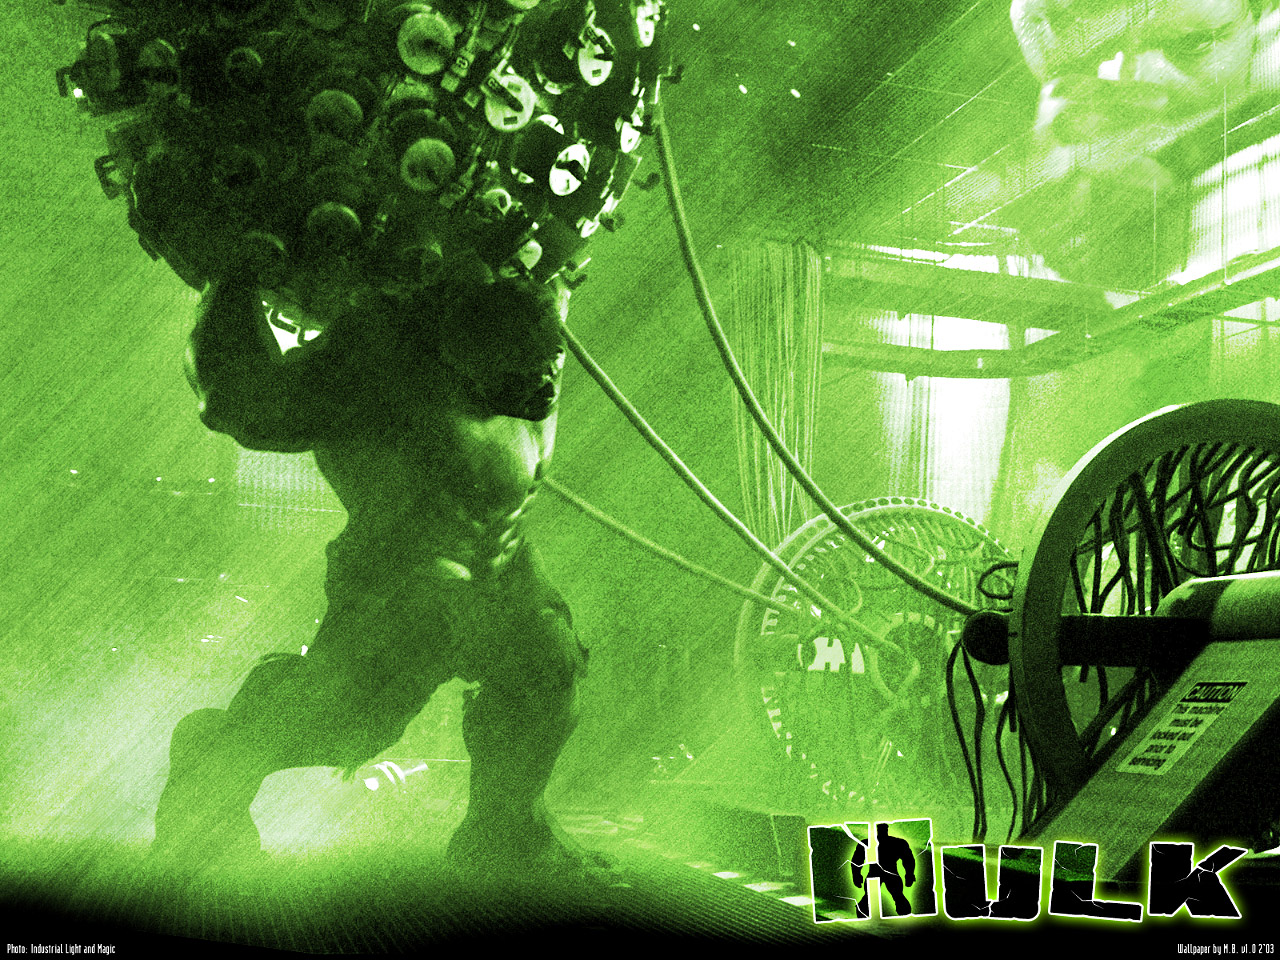 Hulk The Incredible Hulk Wallpaper 14044627 Fanpop   Hulk Wallpapers 1280x960